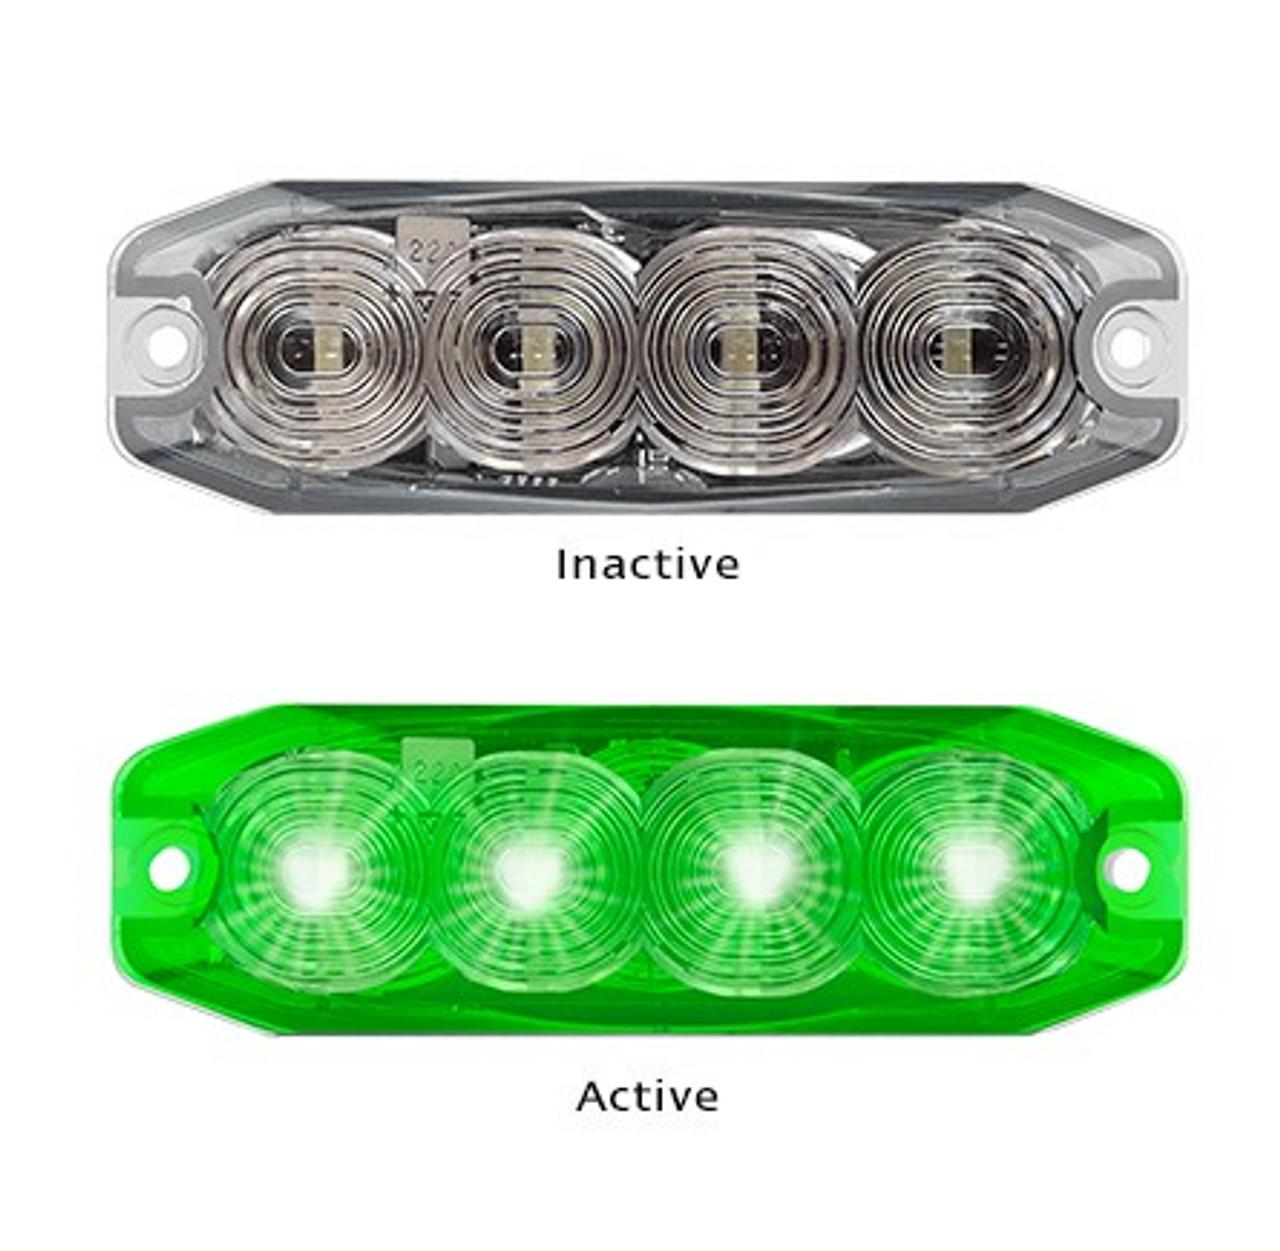 Emergency LED Strobe Module Lamp Green. 11 Strobe Patterns Multi-Volt 12-24 Volt 3M Tape or Screw On Fitting. Single Pack Clear Housing Clear Lens & Green LED's Super Slim Line Light – Go Stealth 120034GM